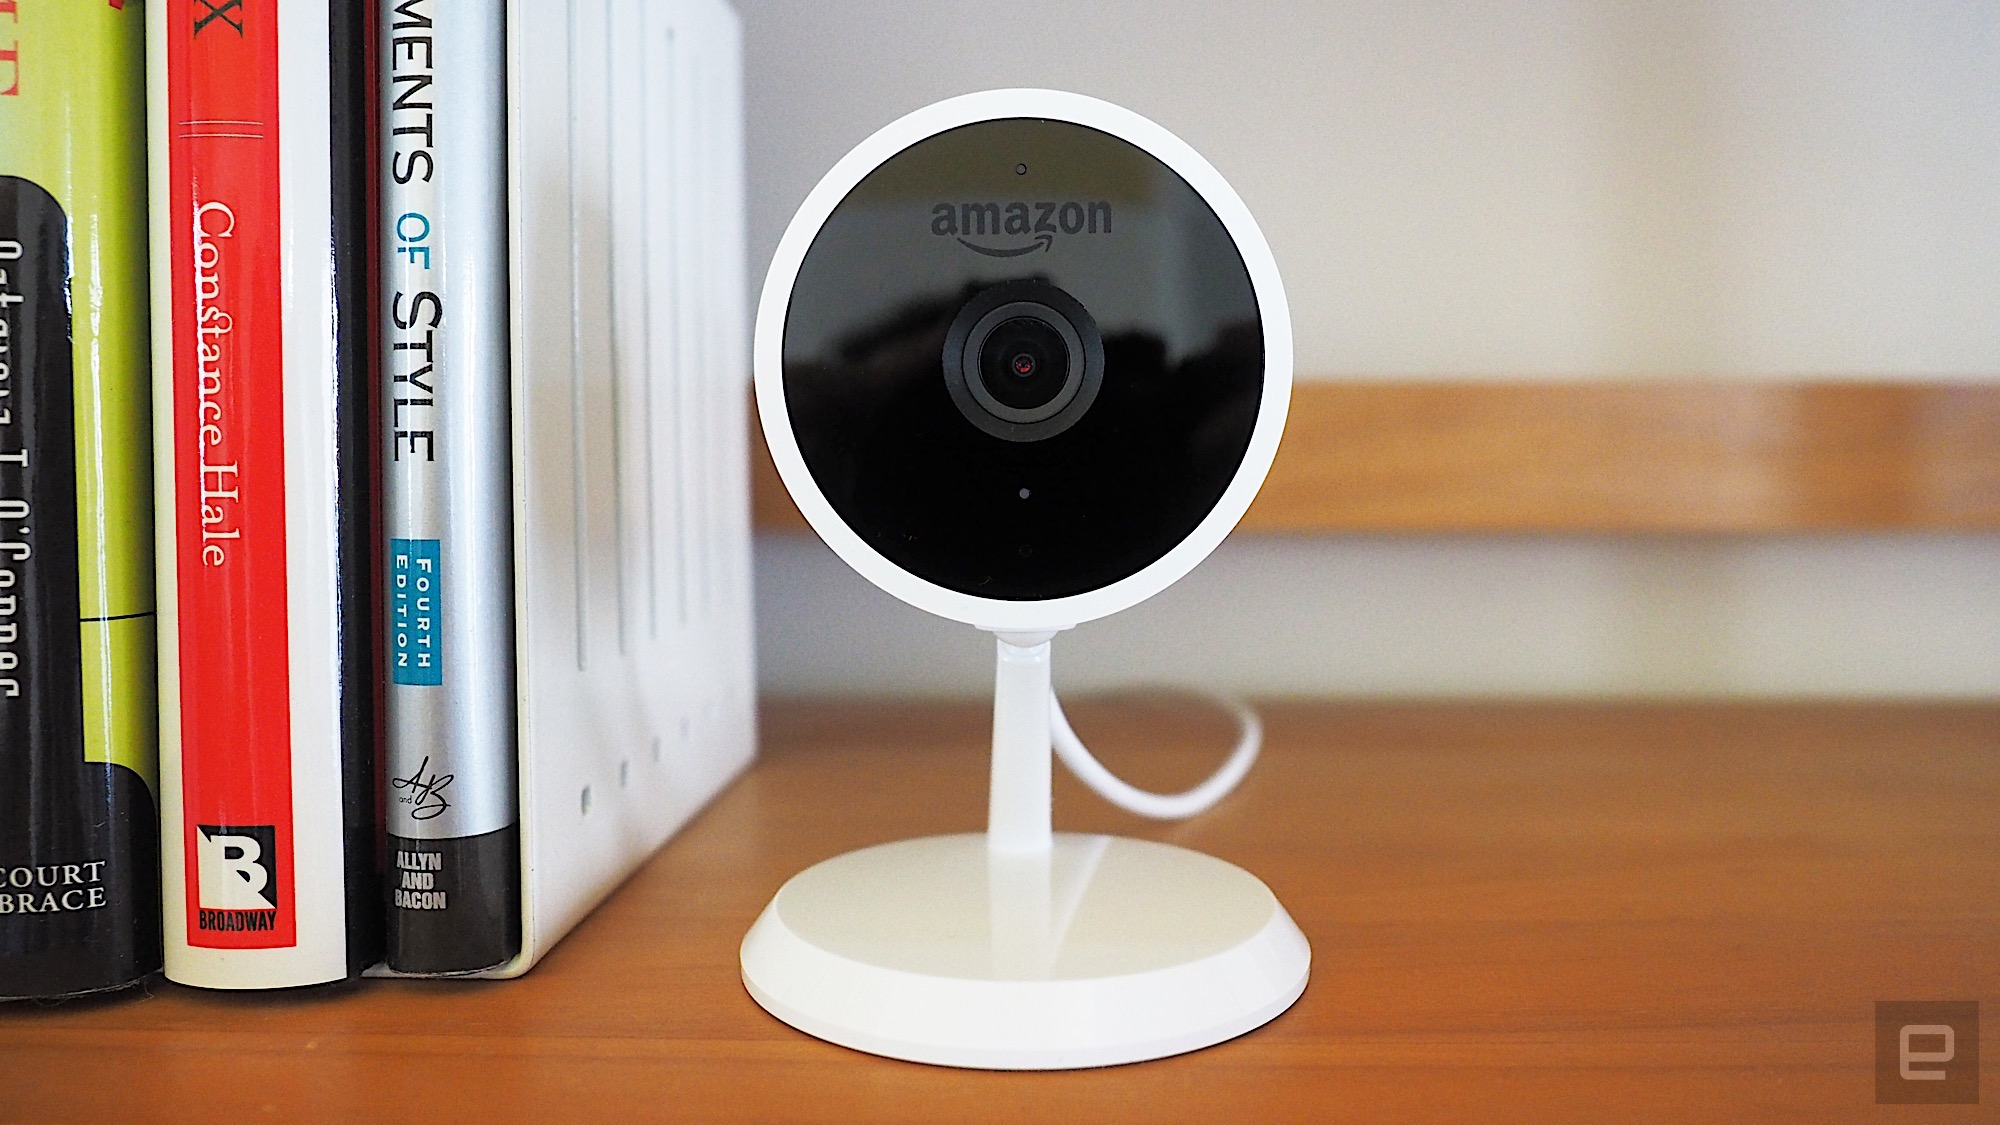 c2e04b9512c587 Amazon Cloud Cam review  A Nest Cam rival with Alexa smarts